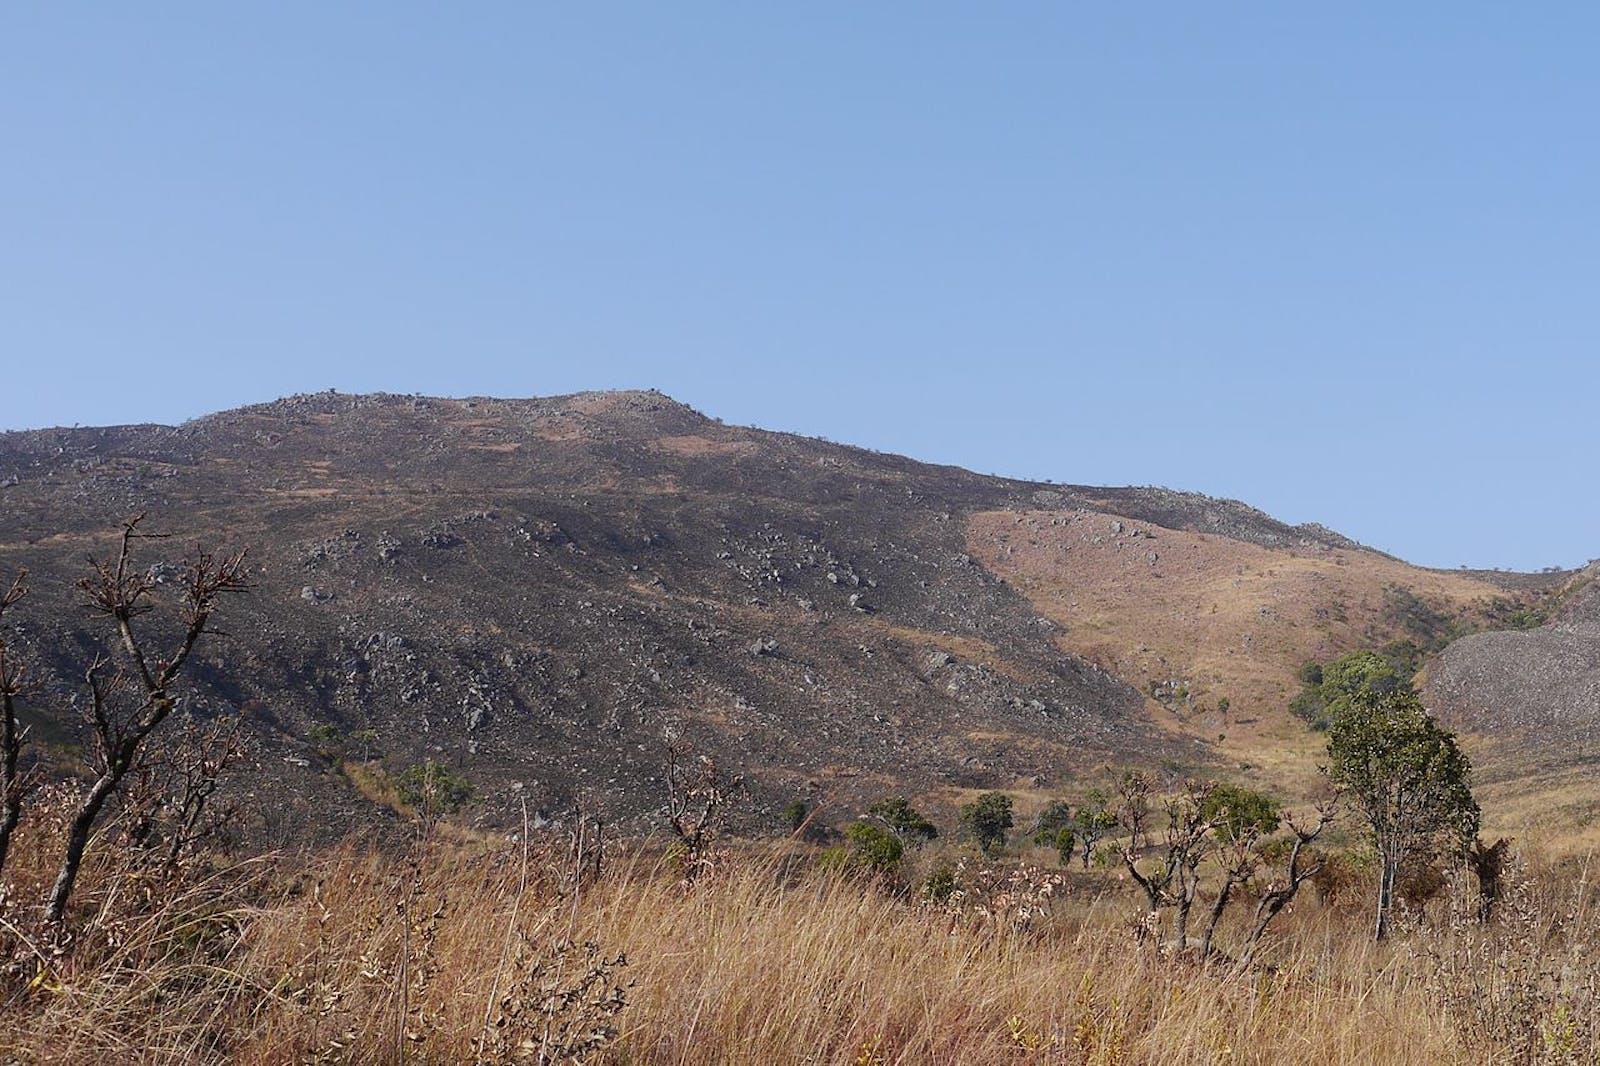 Angolan Montane Forest-Grassland